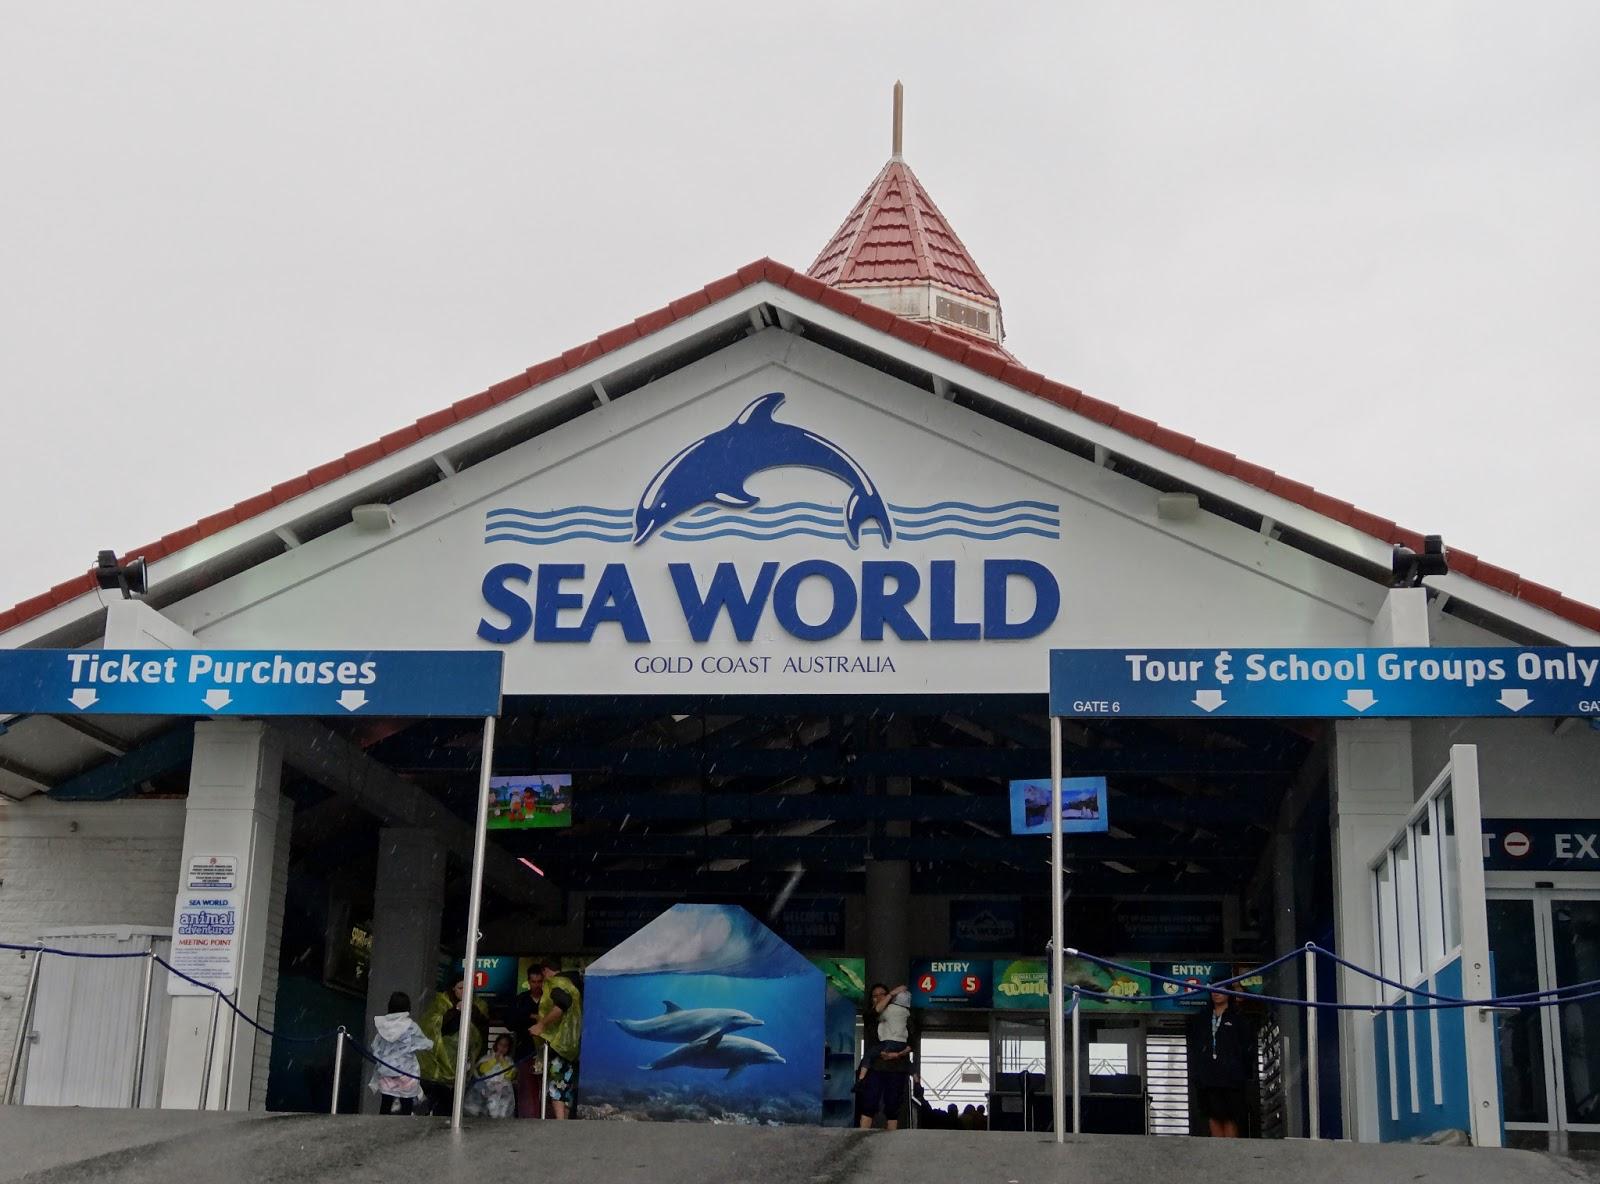 Seaworld Gold Coast Car Park